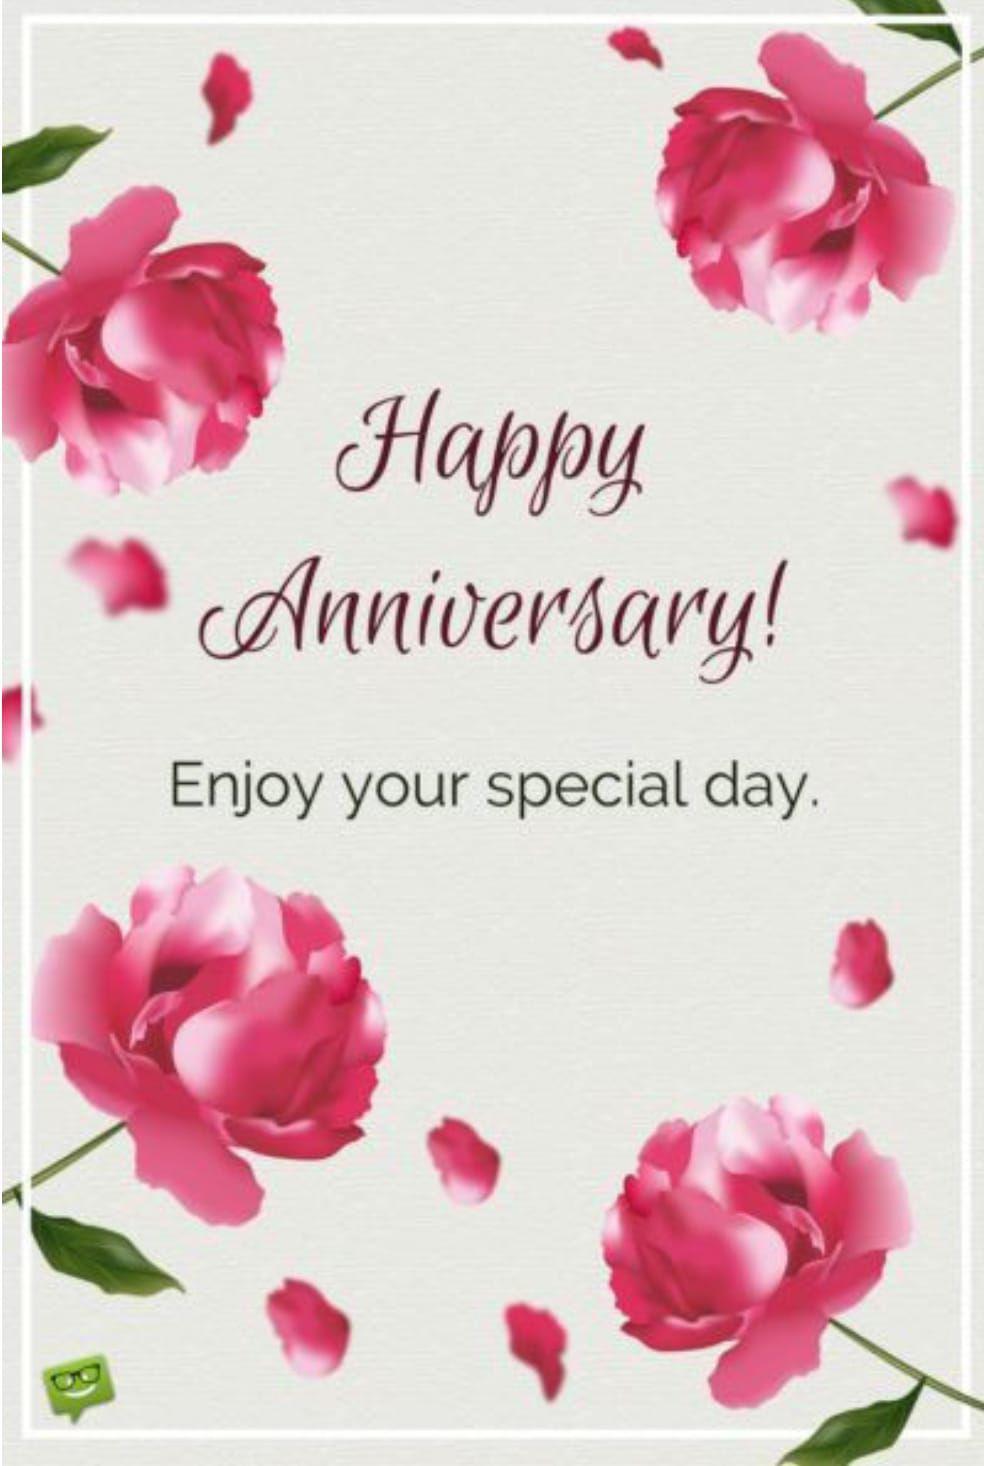 Pin By Maxine Pearl Shultz On Happy Anniversary Happy Anniversary